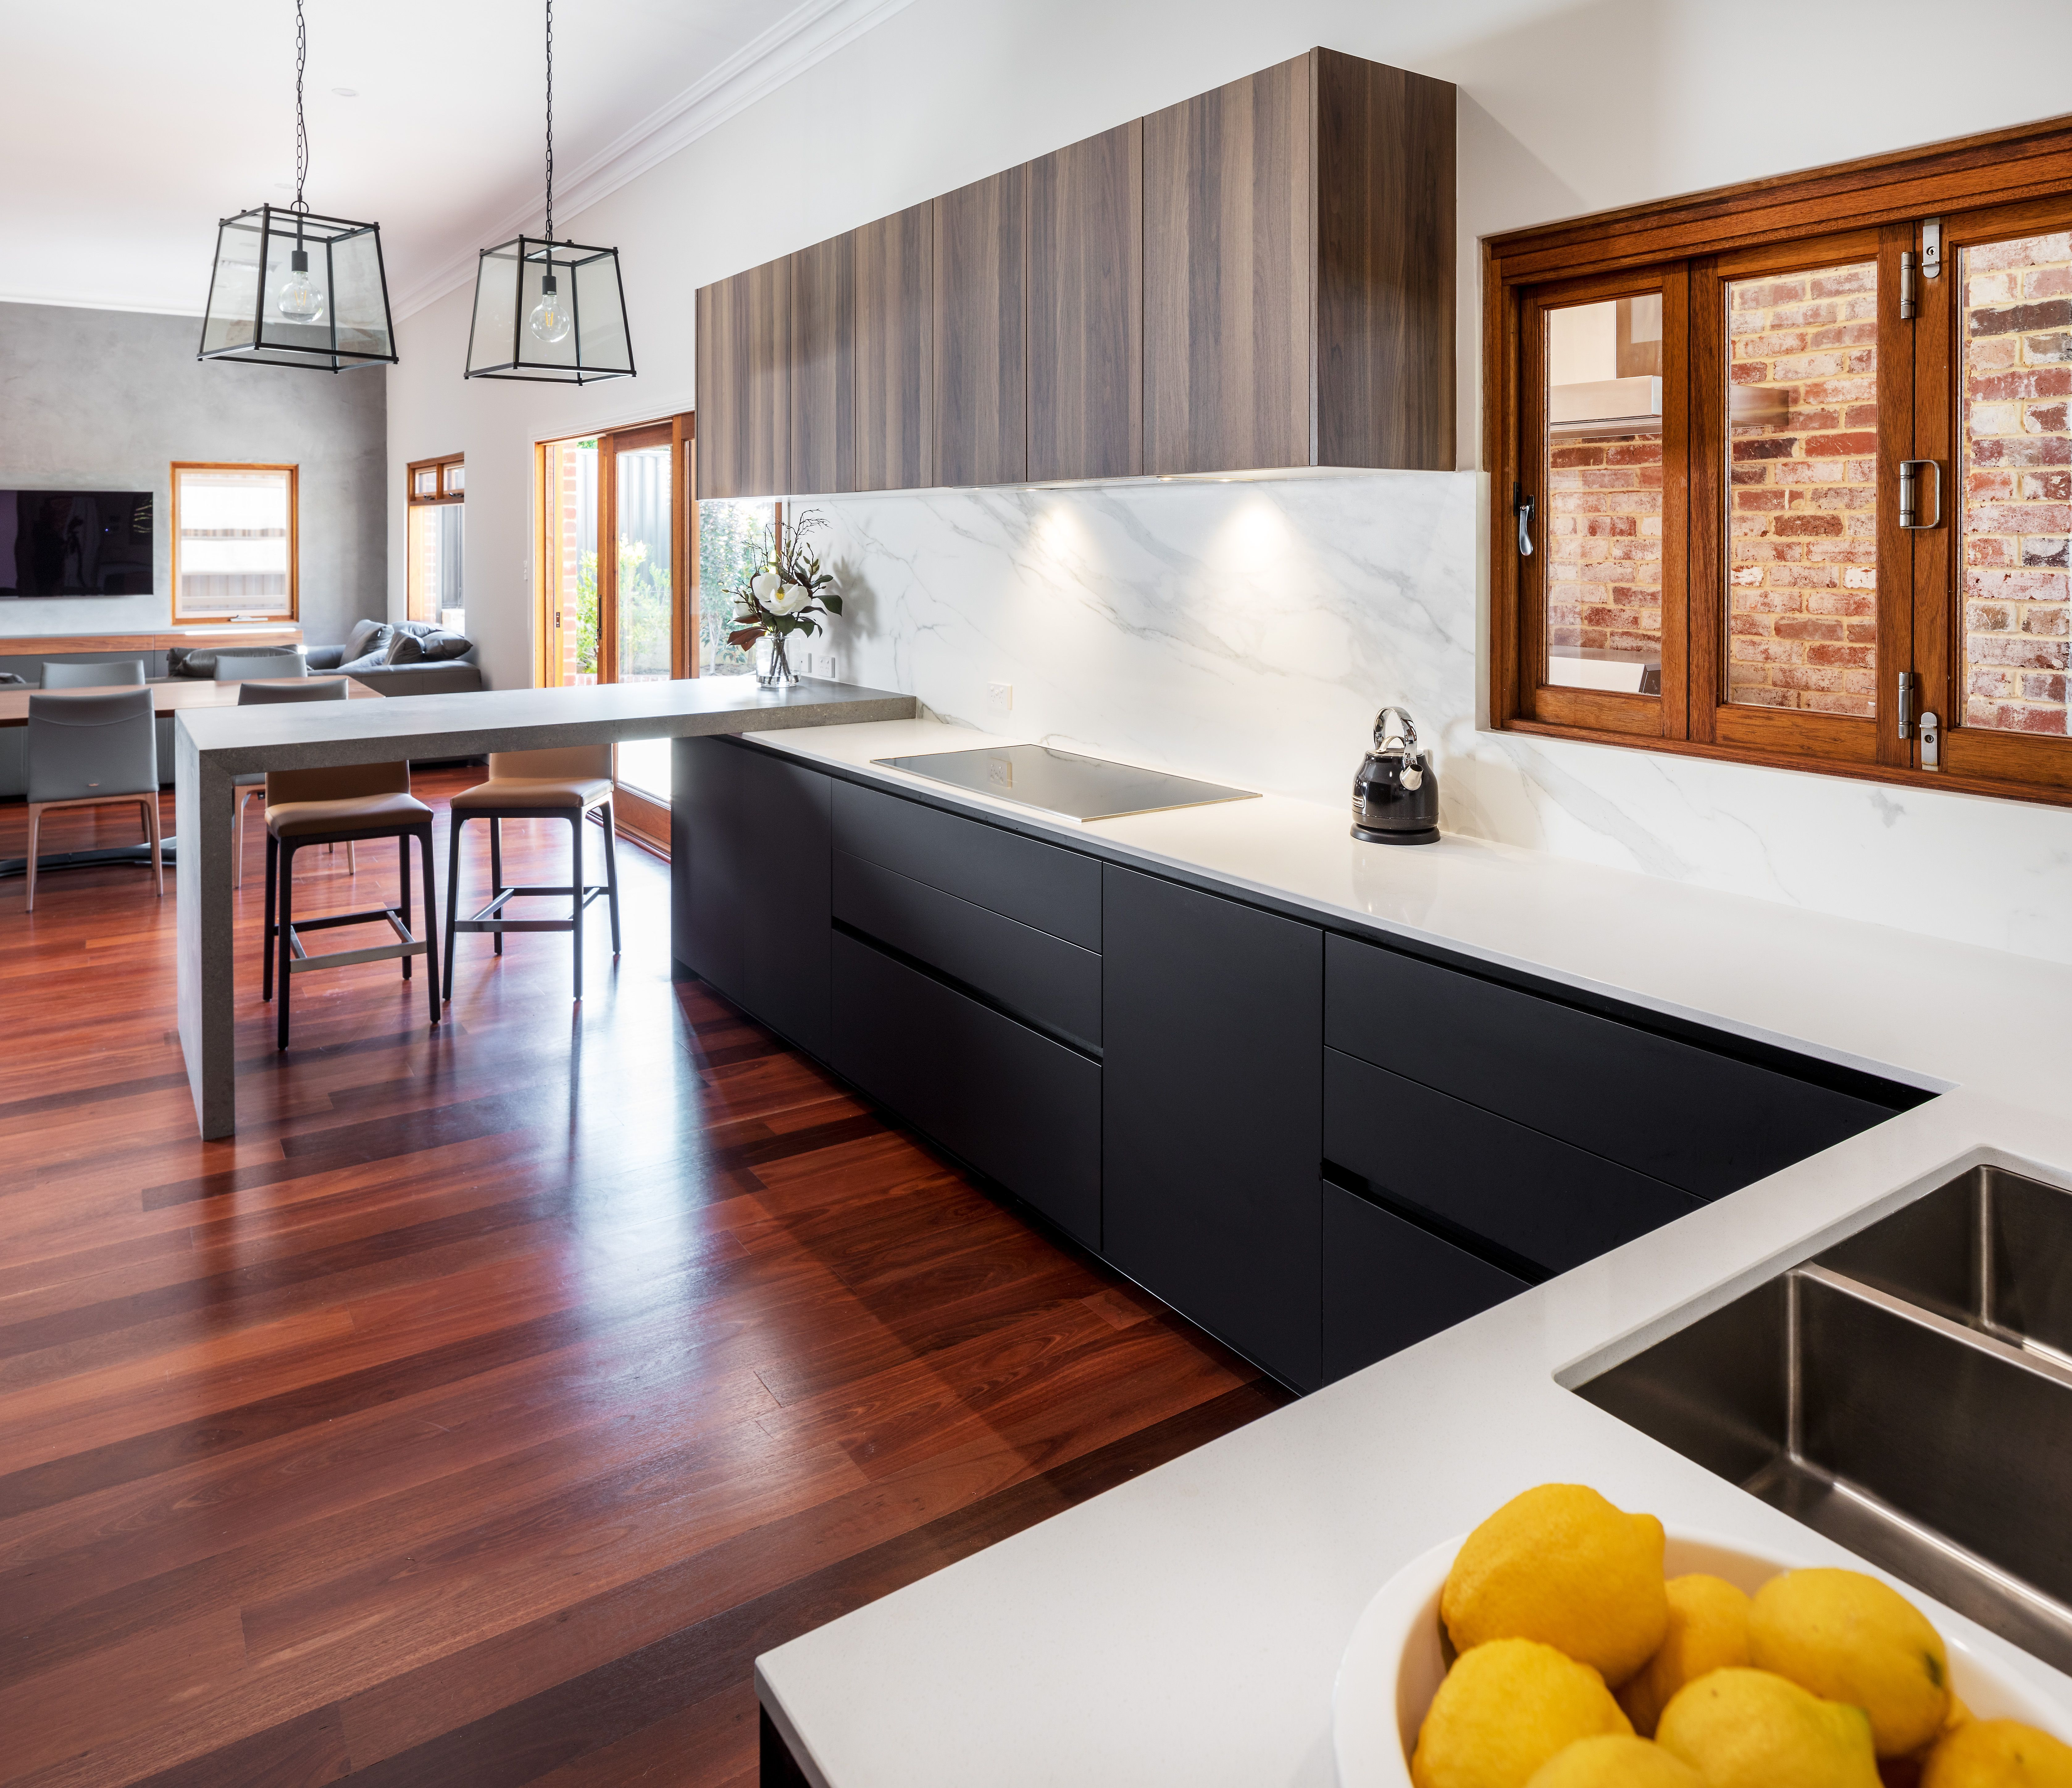 Kitchen Renovation, Renovation, Renovations